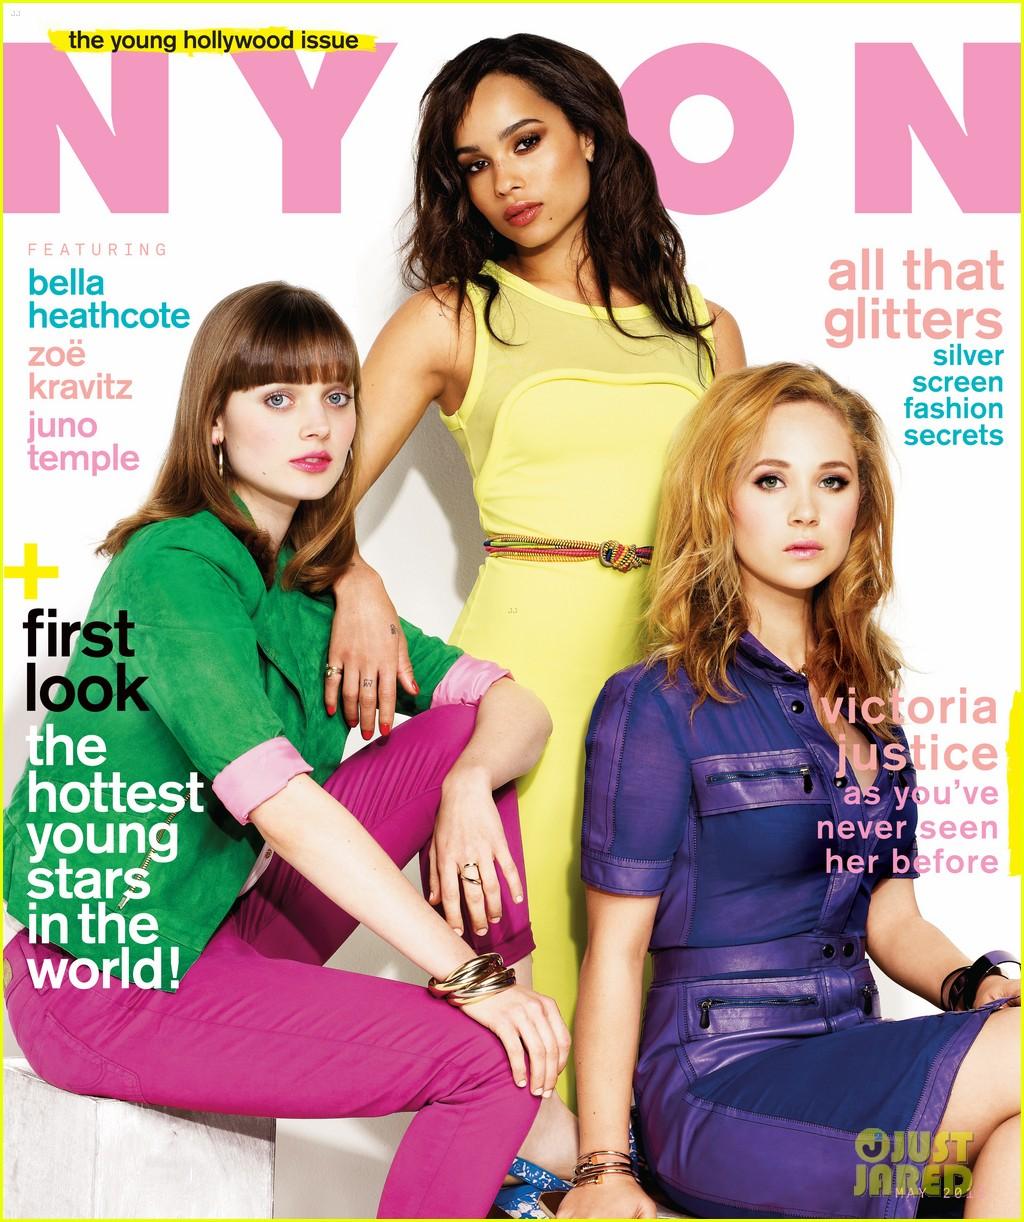 zoe kravitz juno temple nylon magazine cover 05